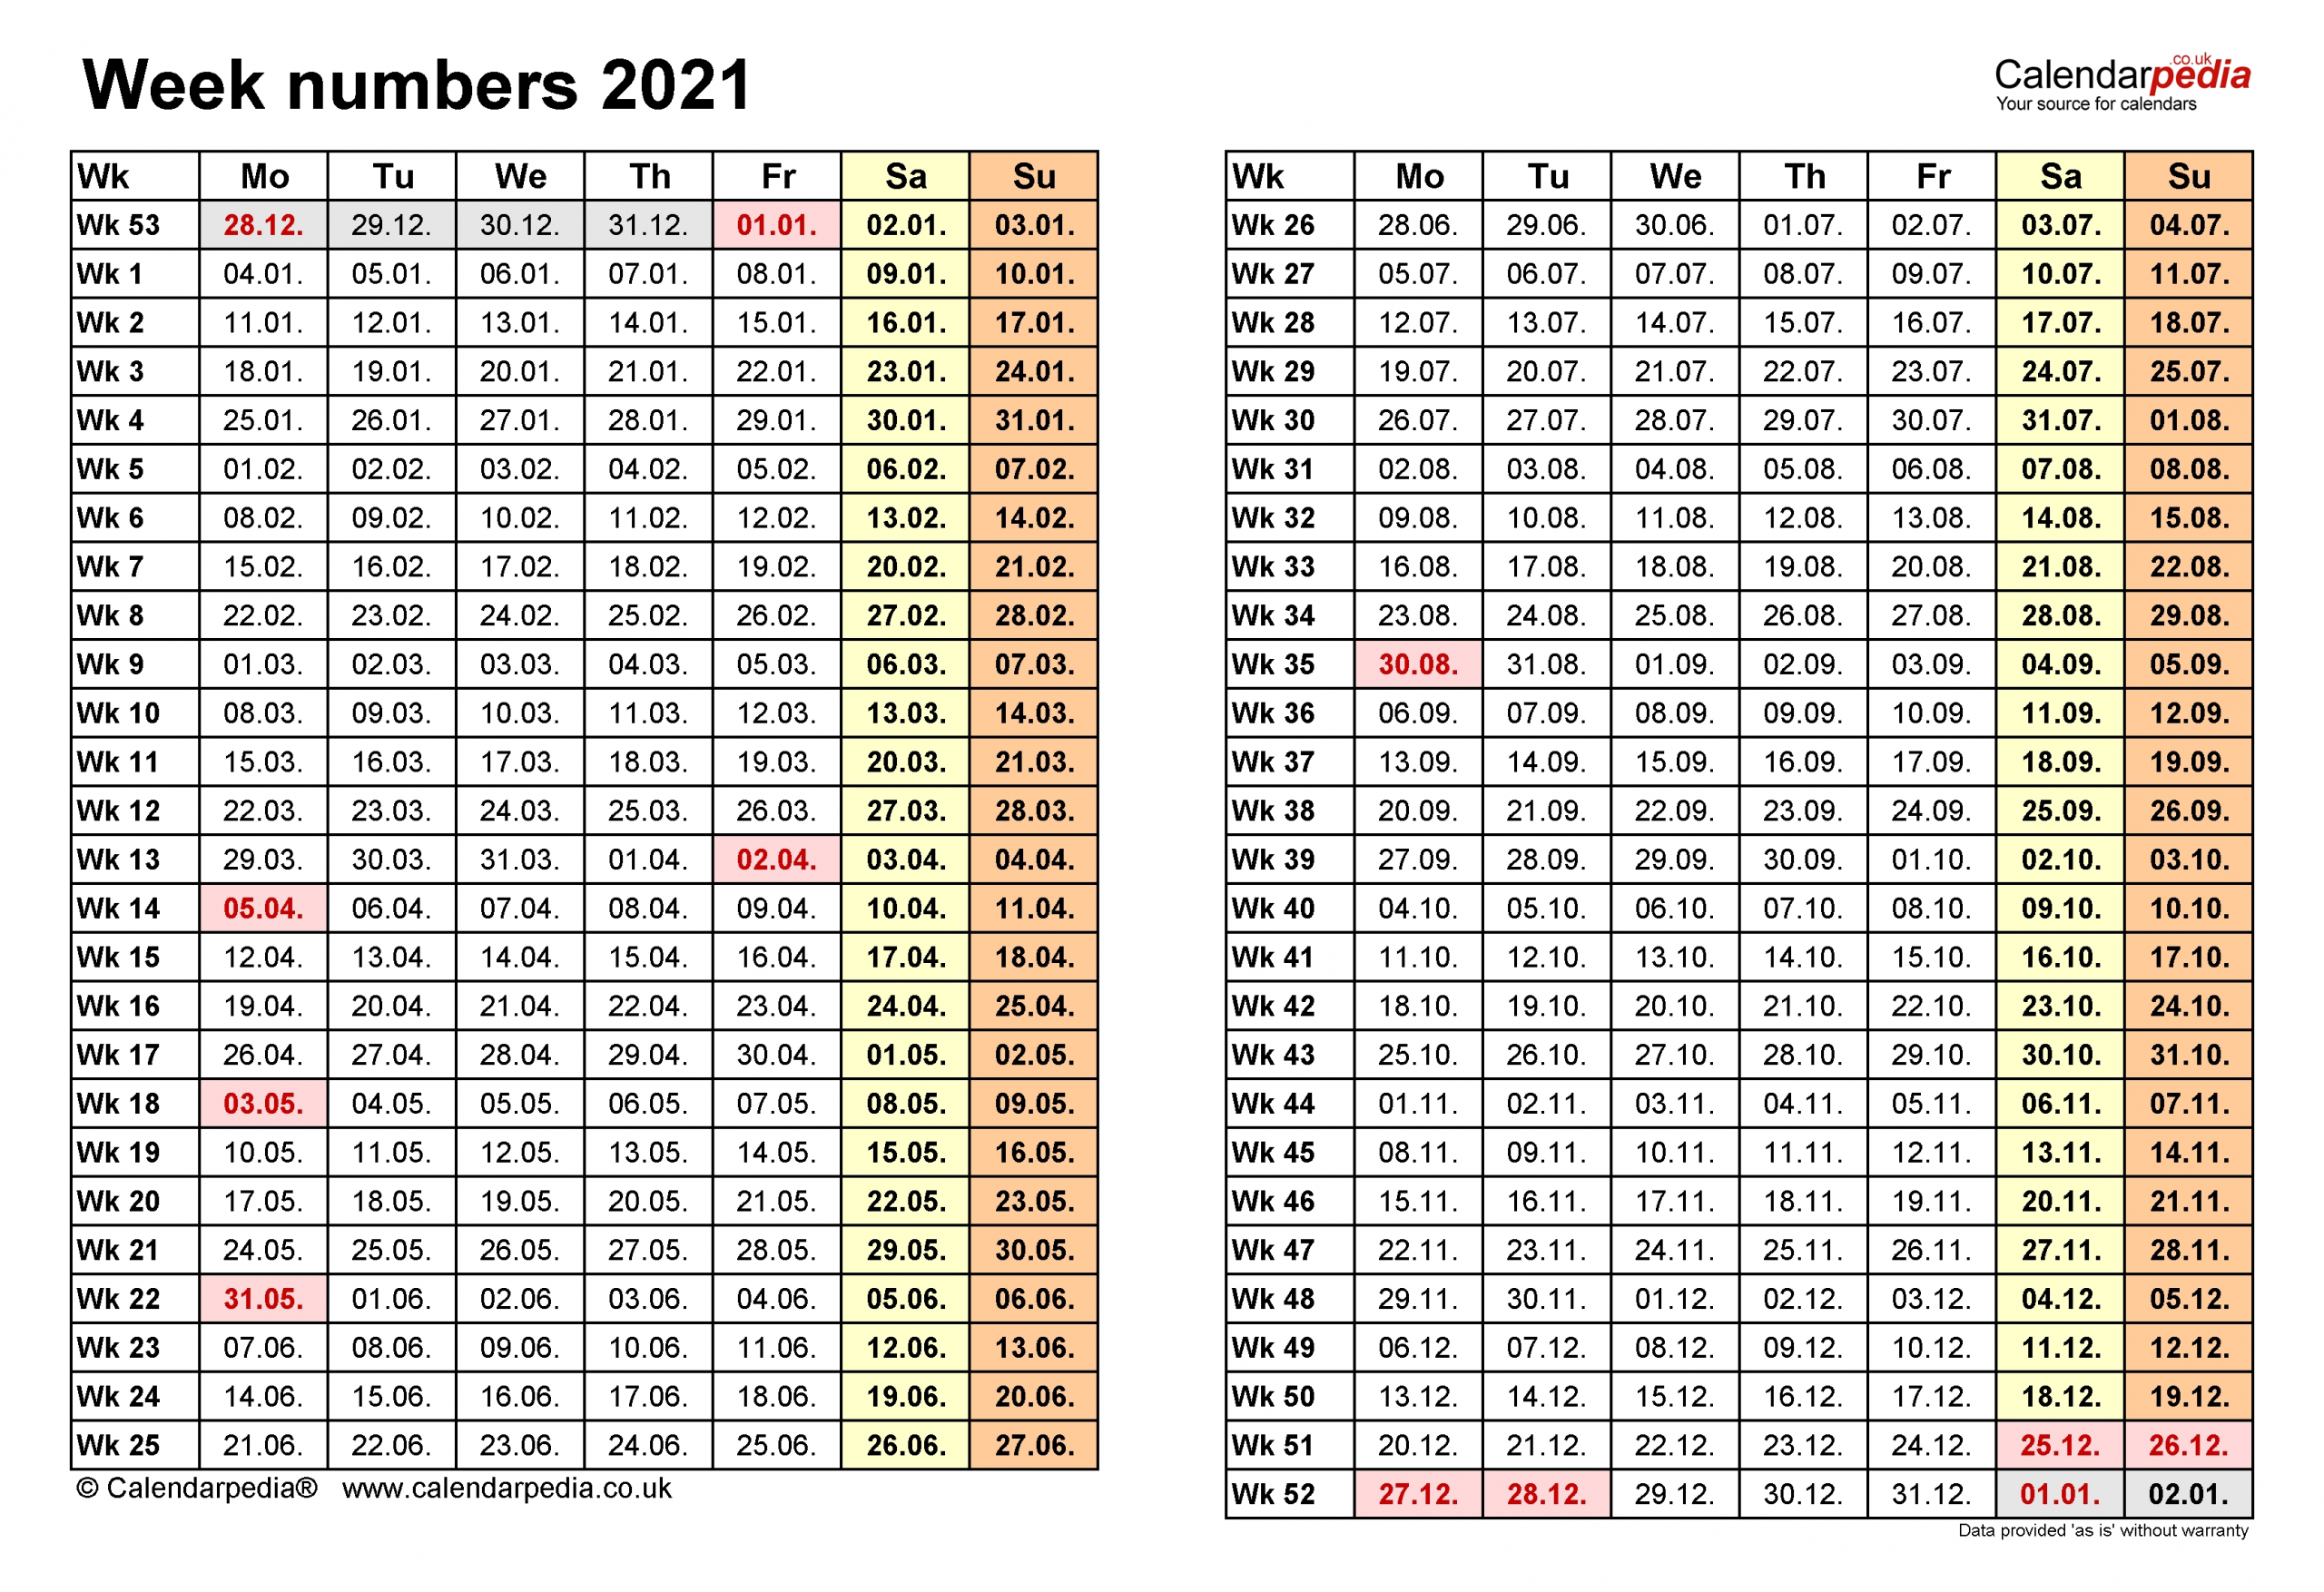 Week Numbers 2021 With Excel, Word And Pdf Templates-2021 Calnder By Week No Excel